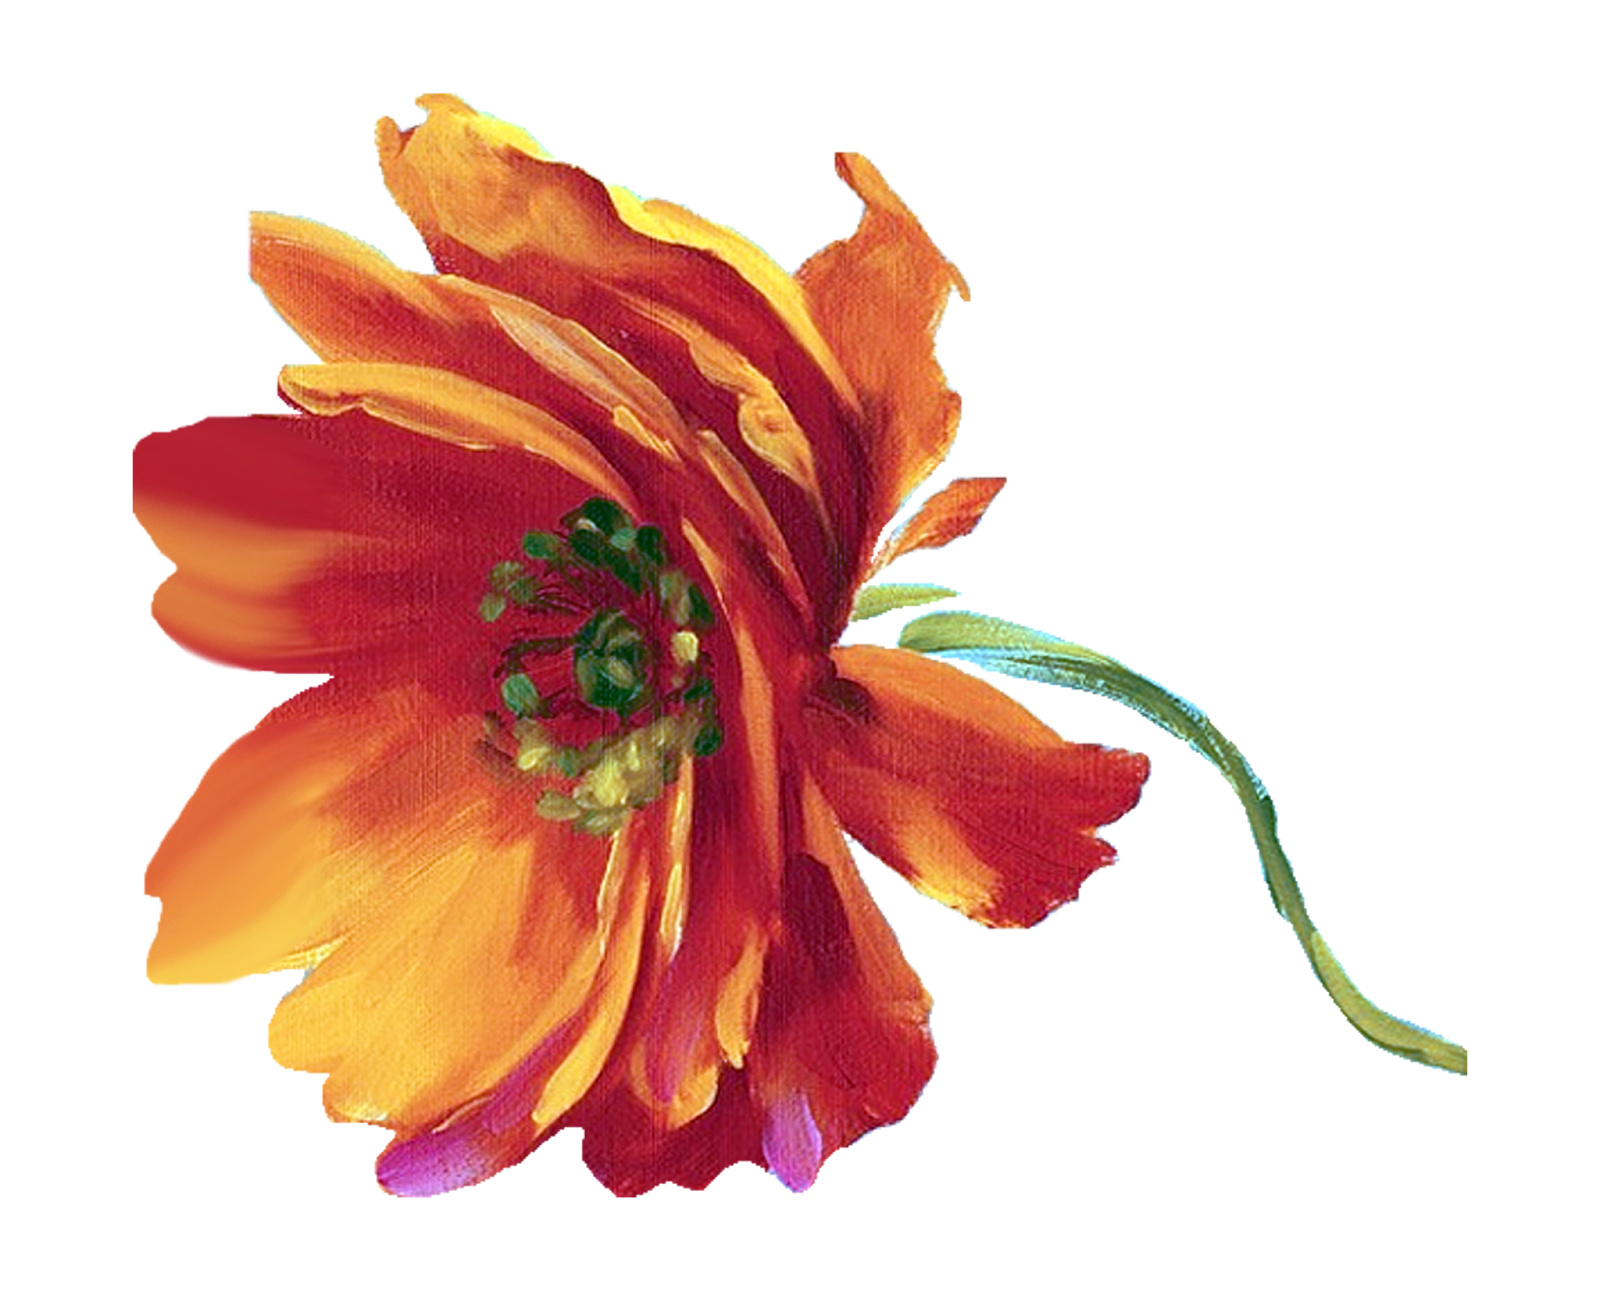 Azalea flower clipart svg royalty free download decoupage flower, flower painting, flower painting png, flower ... svg royalty free download